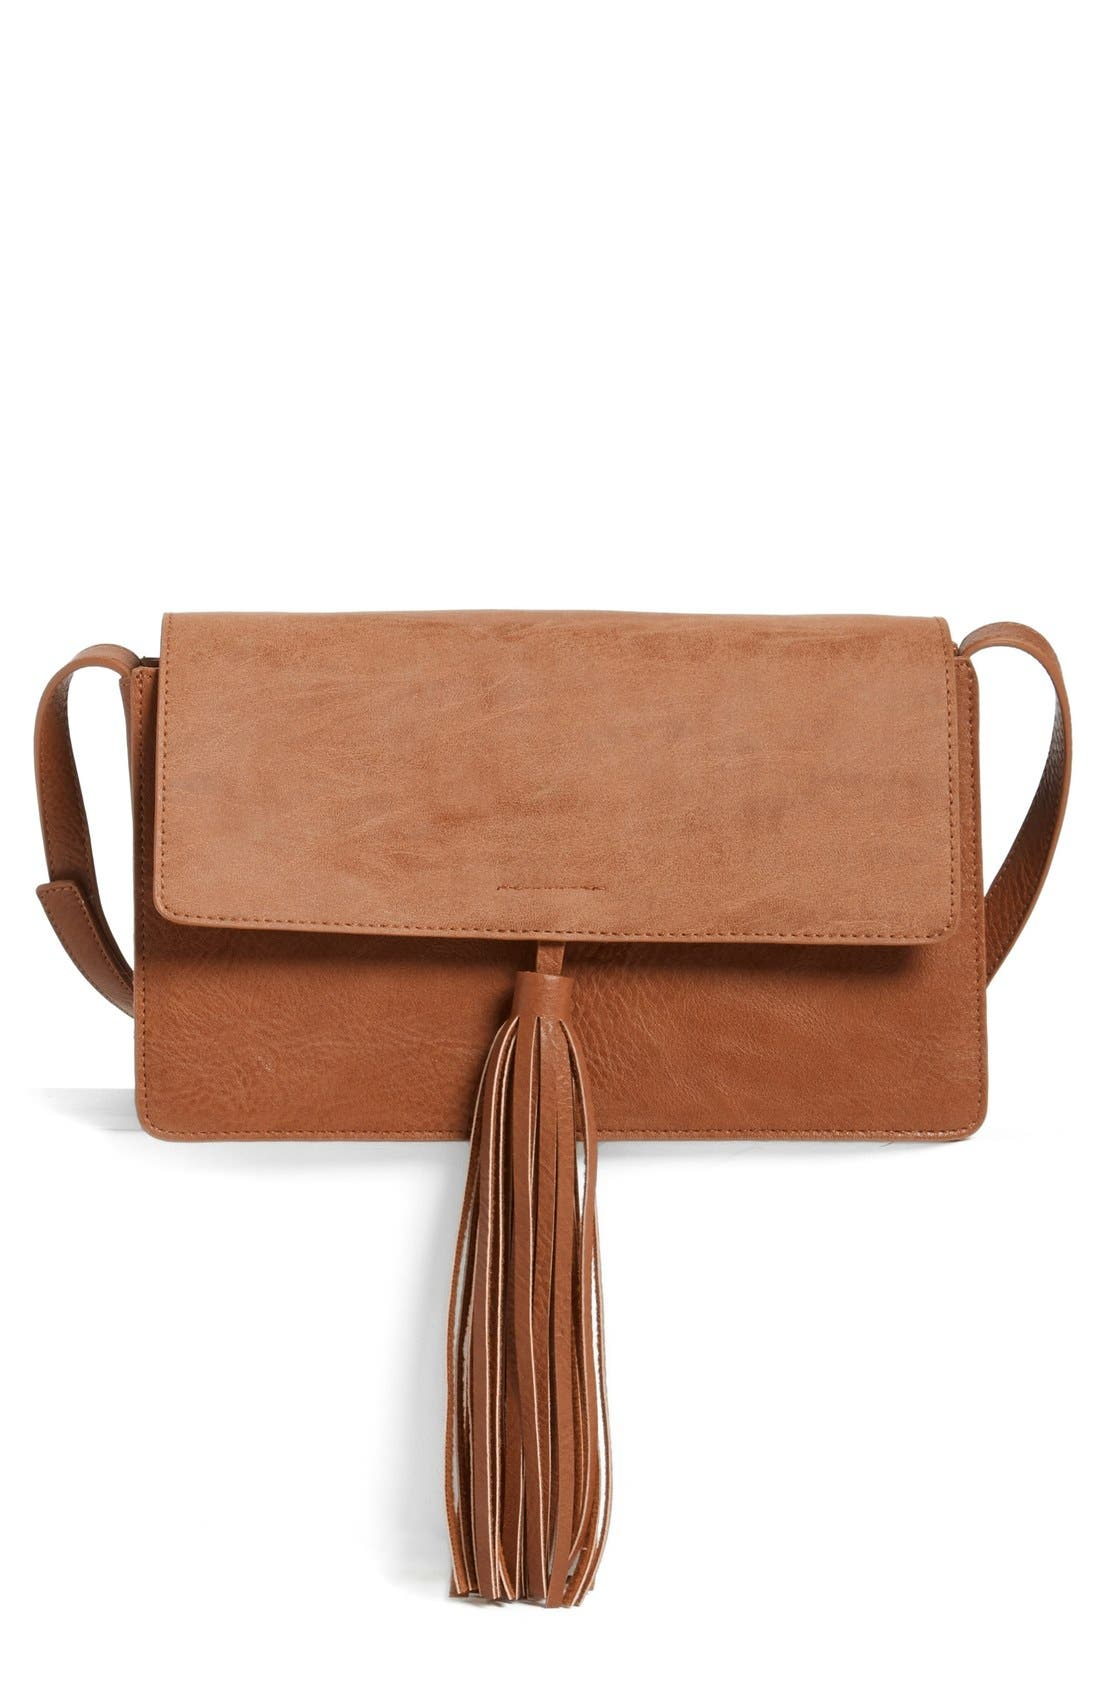 Main Image - BP. Tassel Faux Leather Crossbody Bag